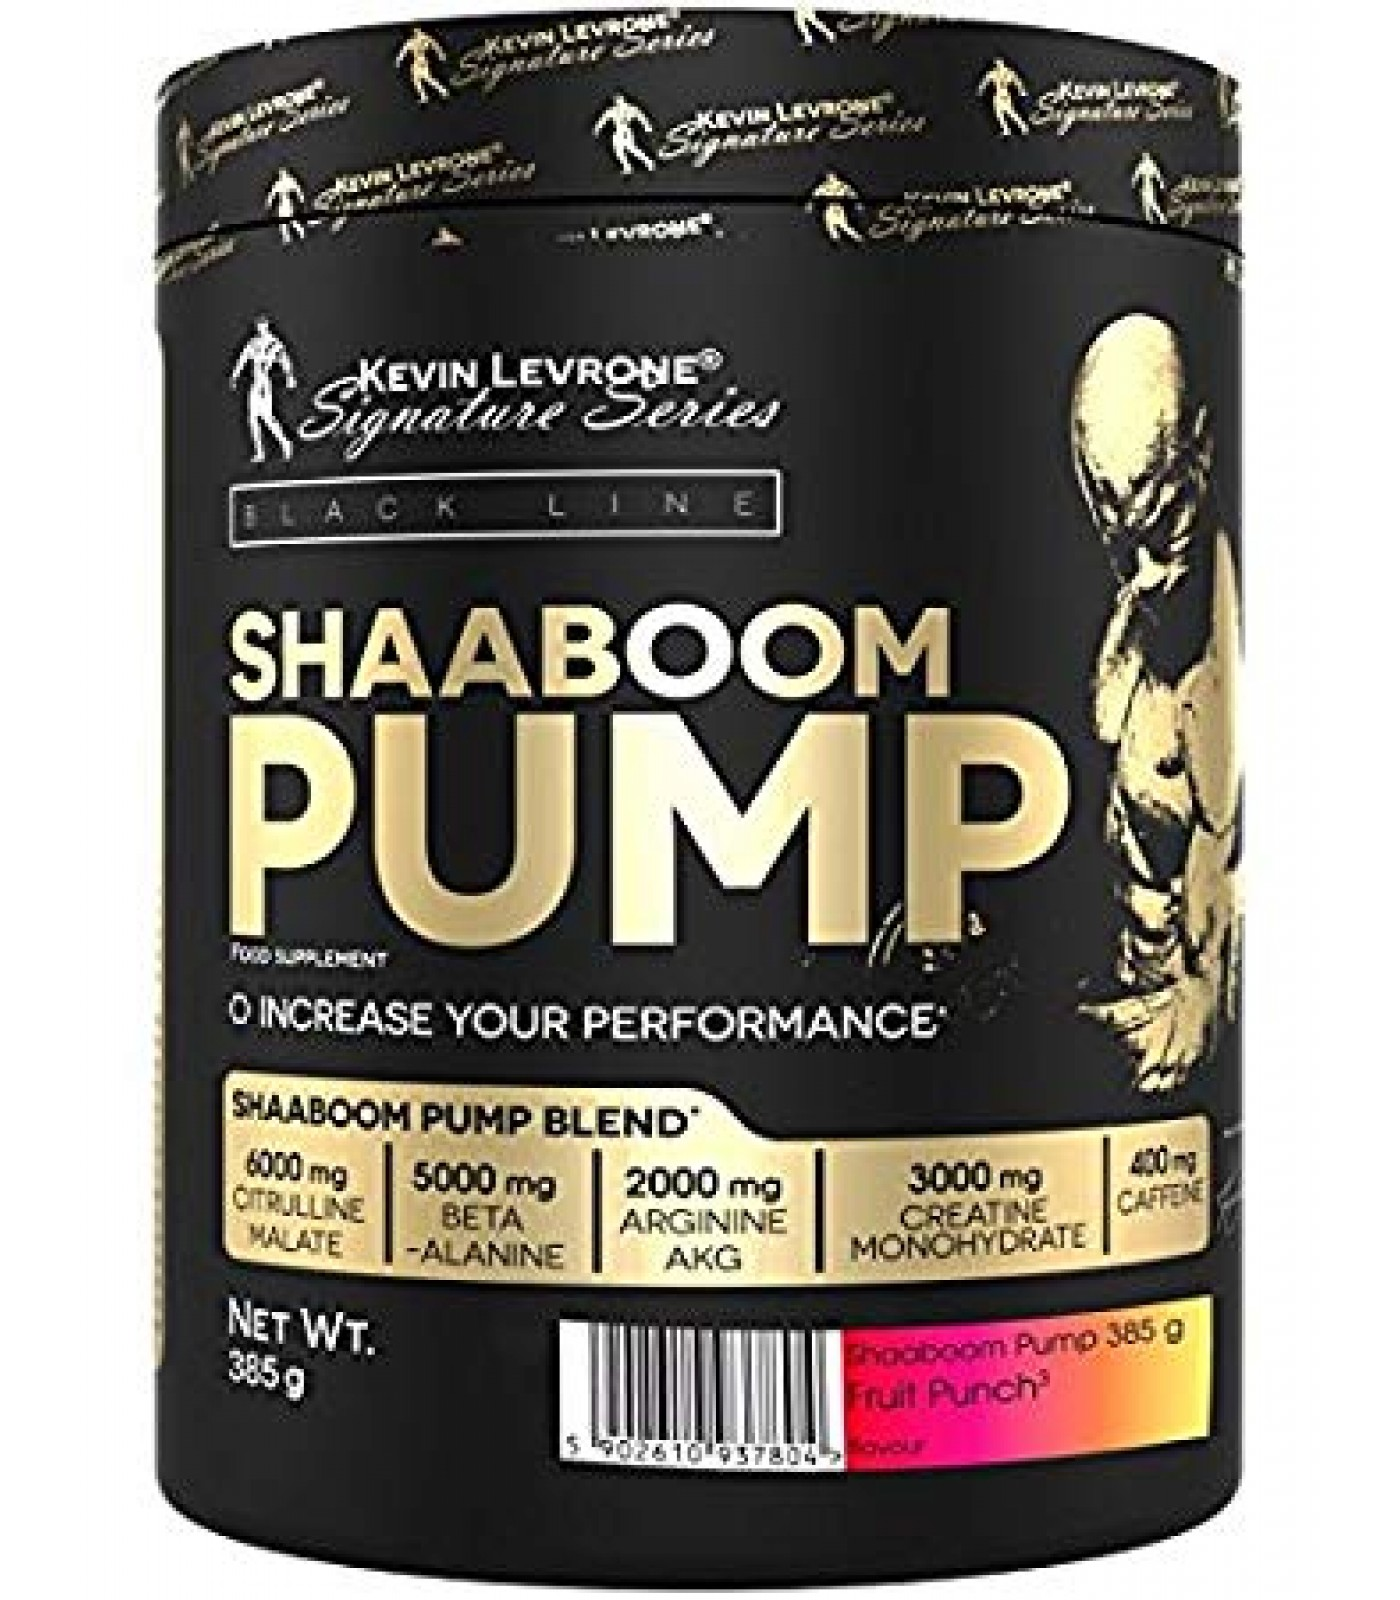 Kevin Levrone Black Line / Shaaboom Pump - 44serv.